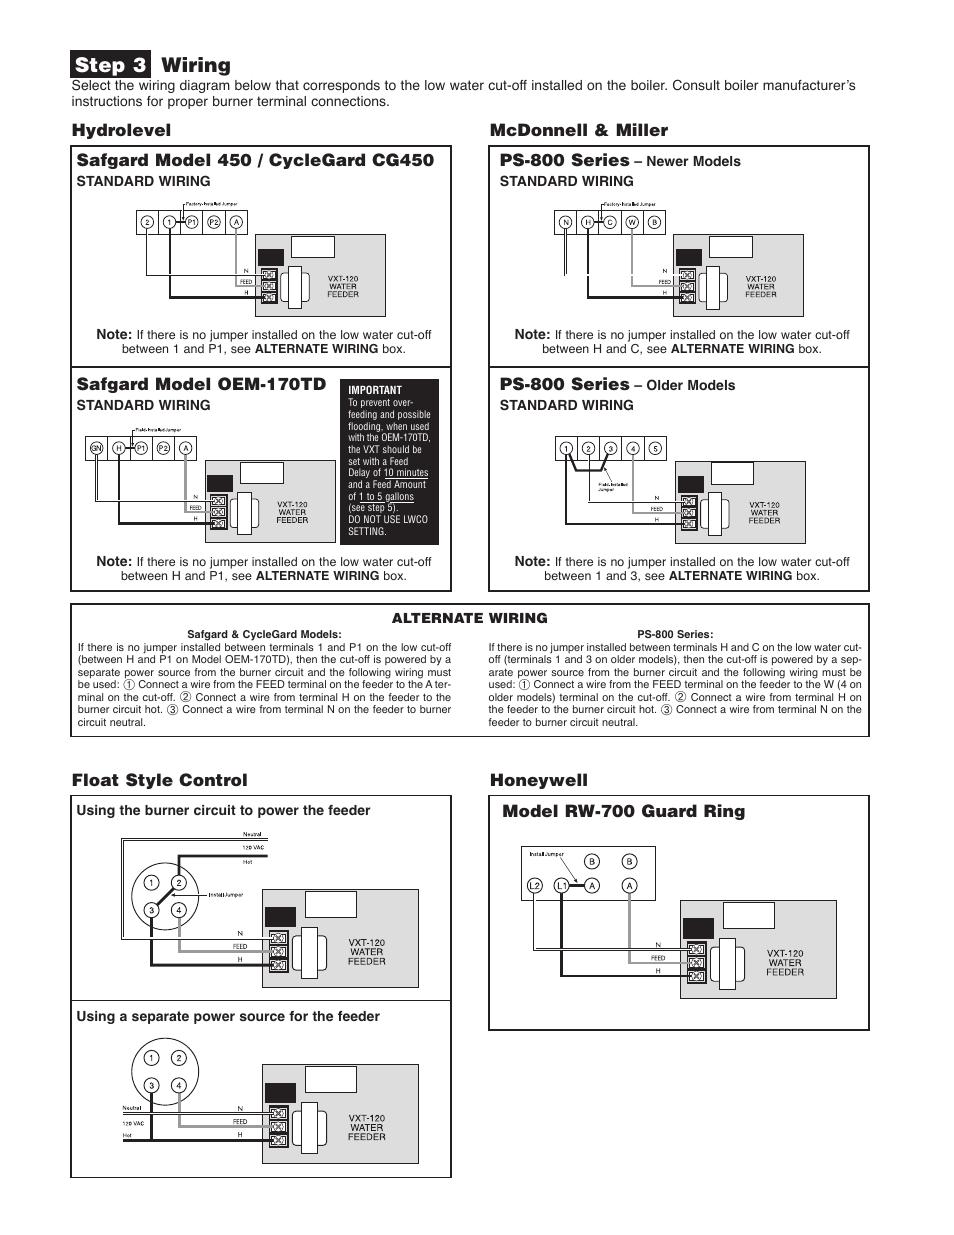 Low Water Cutoff Wiring Diagram from lh3.googleusercontent.com